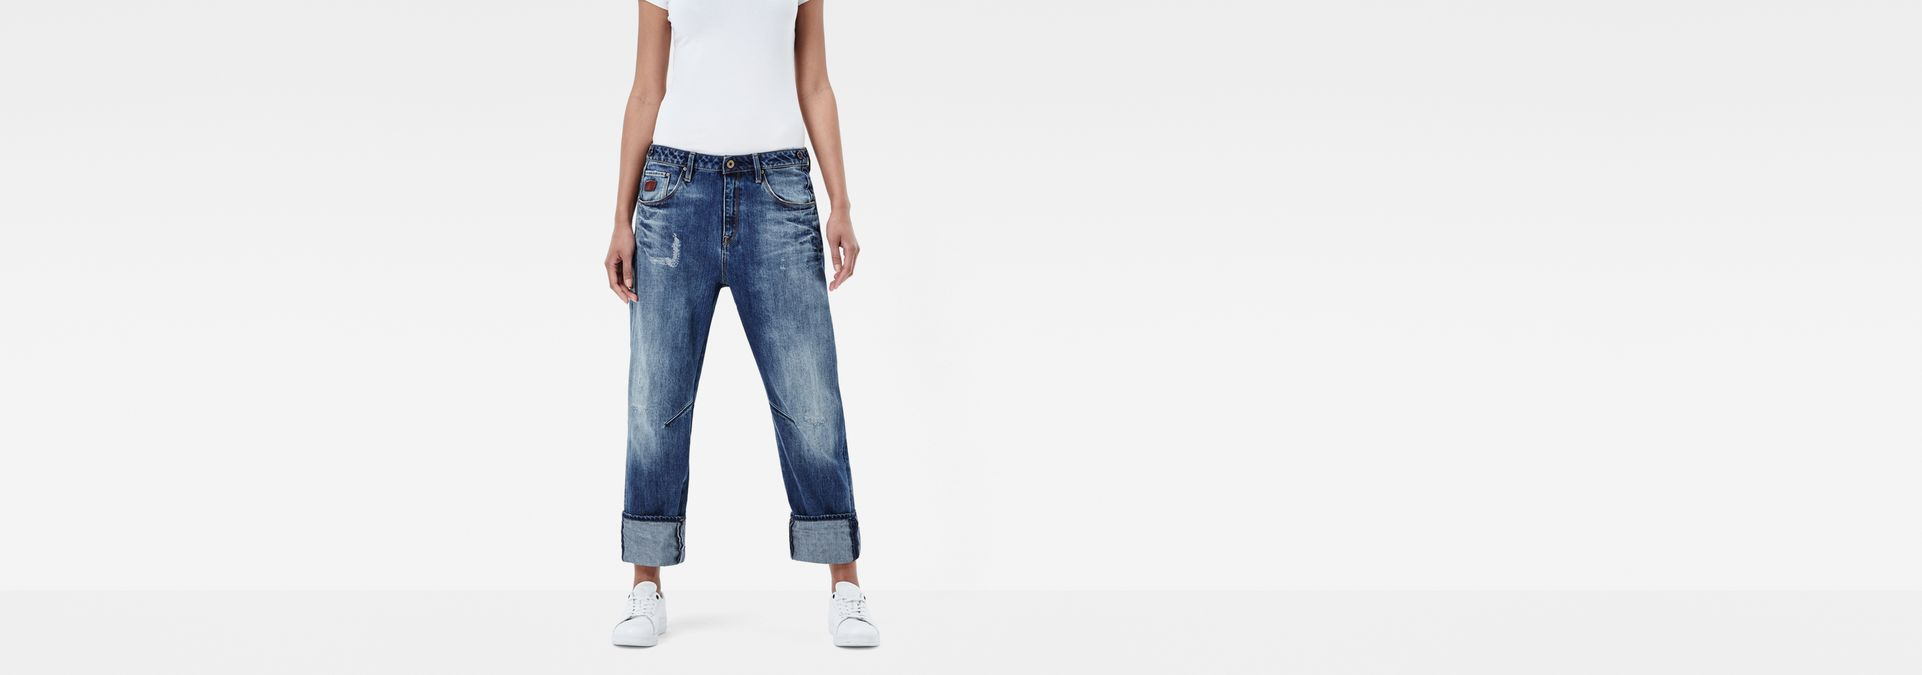 arc braces oversize 3d low boyfriend jeans g star raw. Black Bedroom Furniture Sets. Home Design Ideas